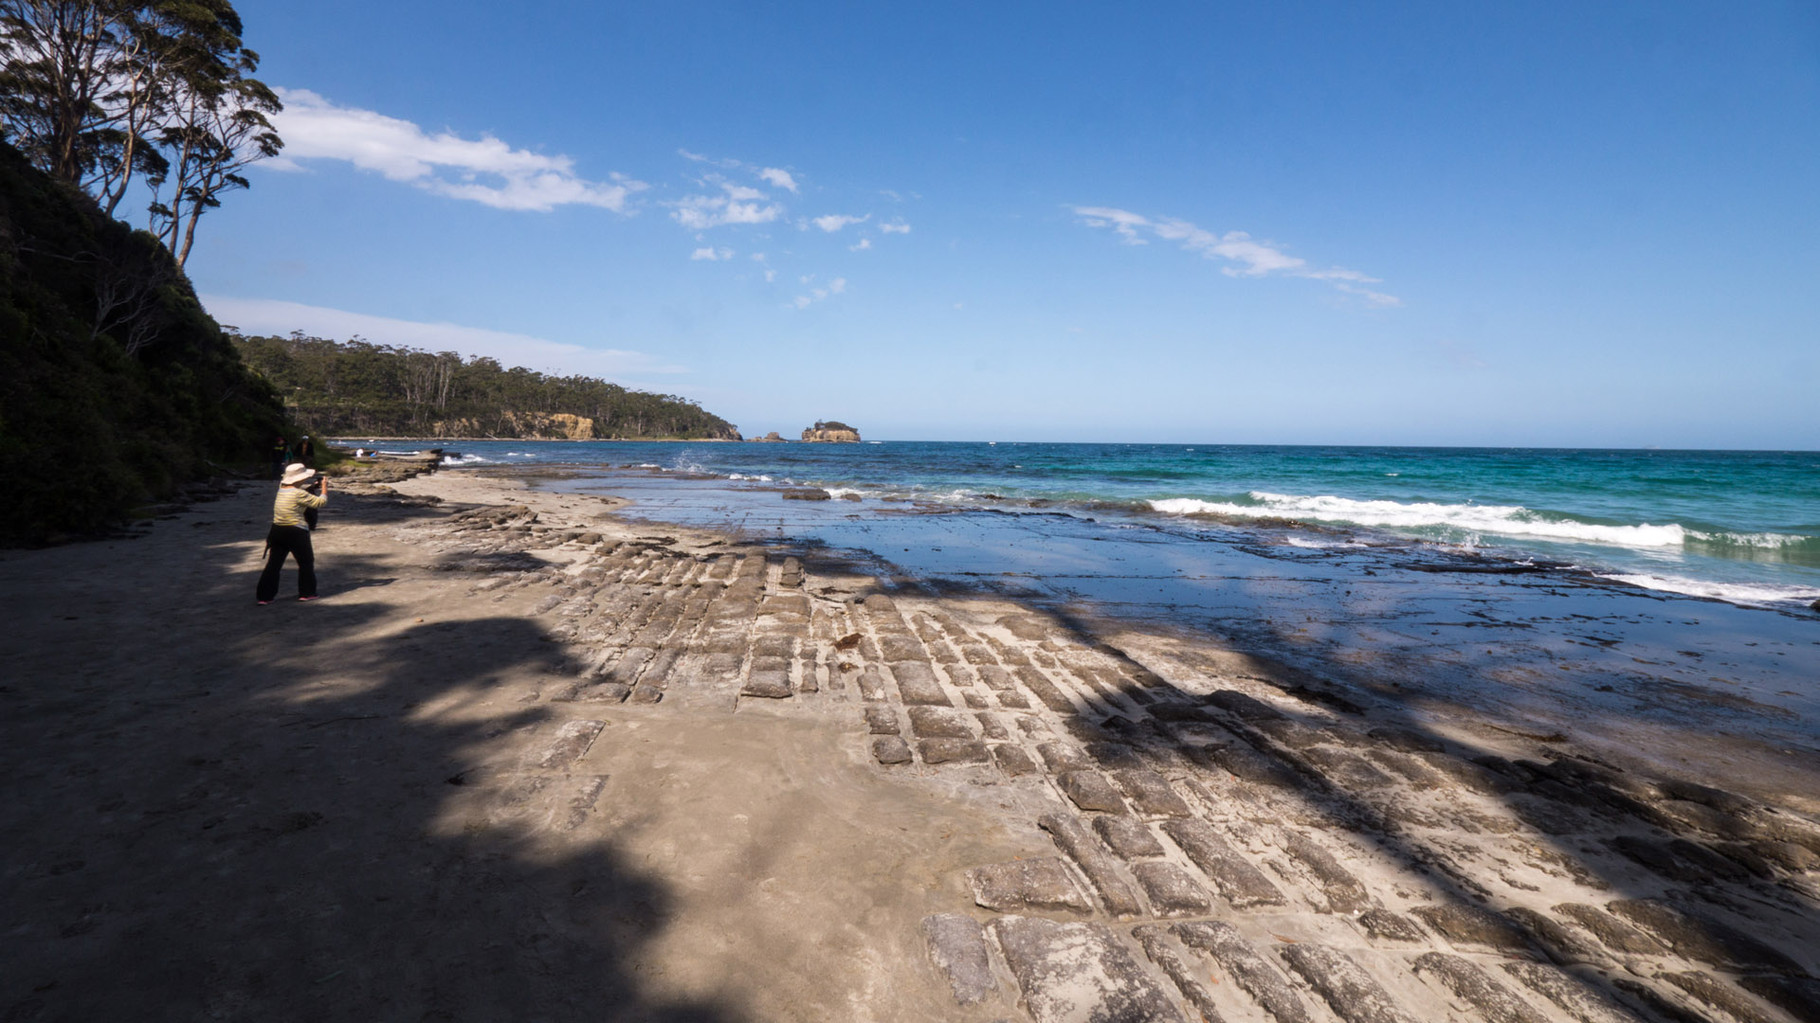 Tassellated pavement beach (all natural), near Eaglehawk Neck